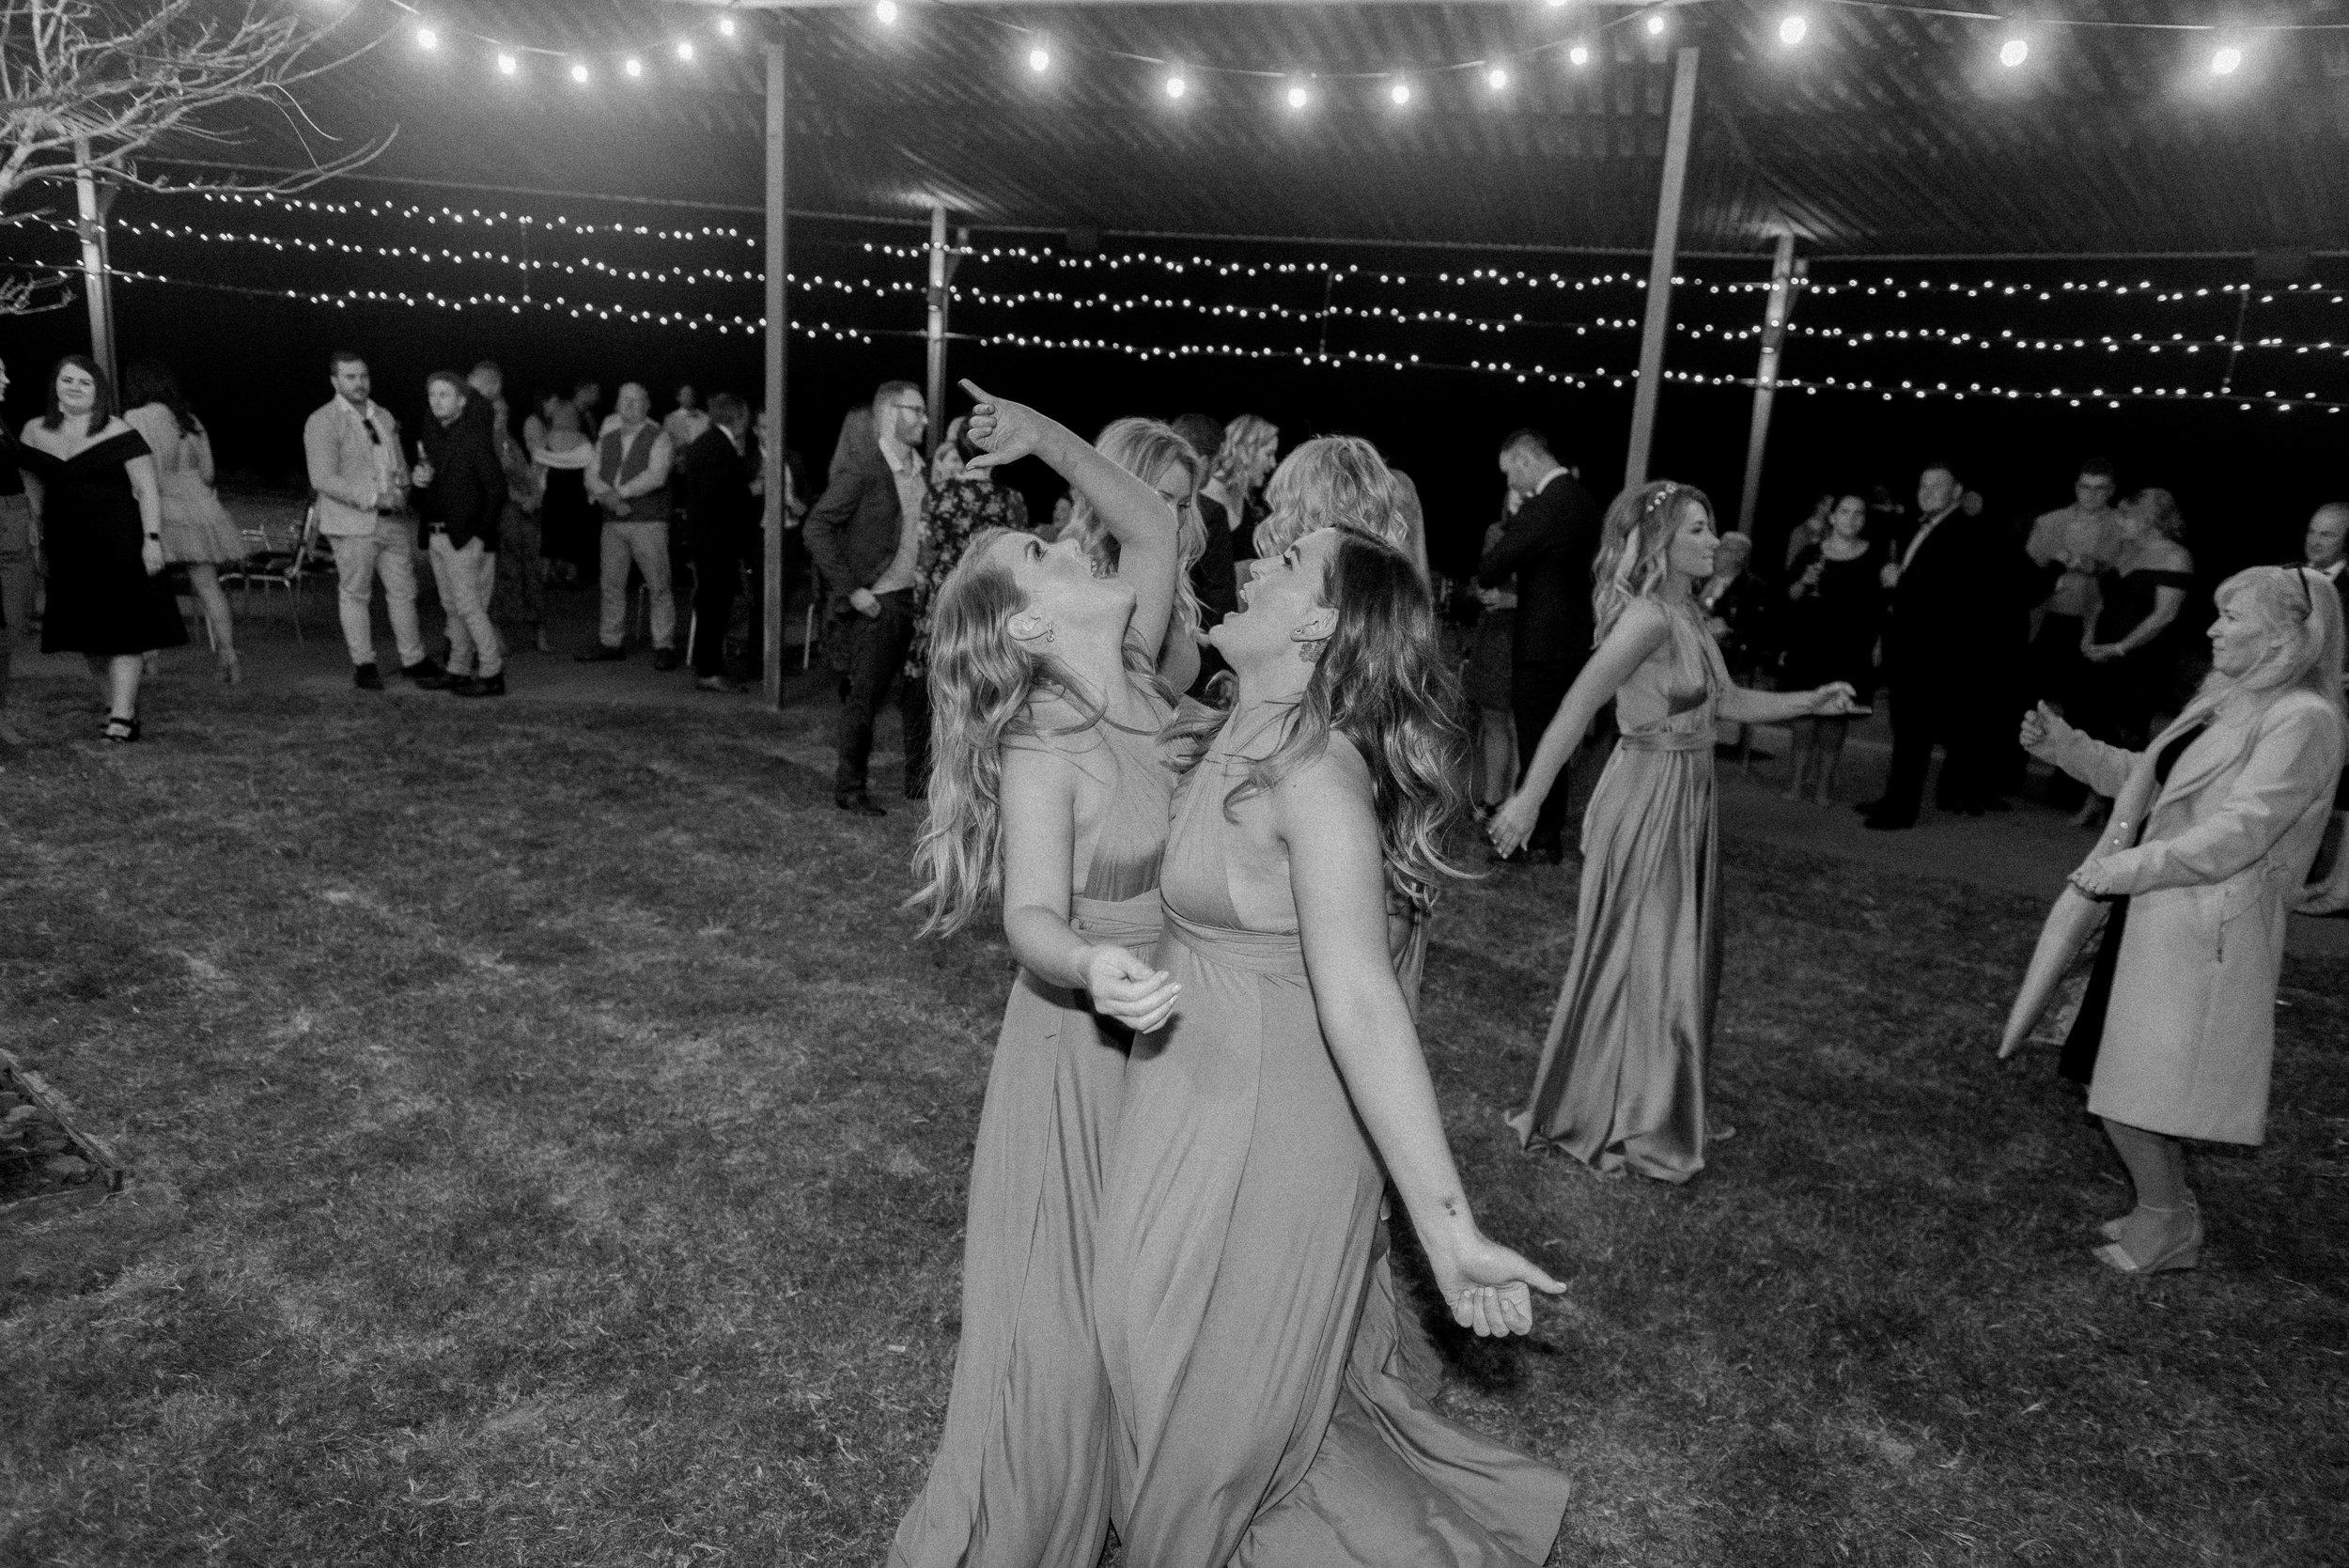 Kooroomba-Vineyard-Lavender-Farm-Wedding-Fine-Art-Lauren-Olivia-90.jpg